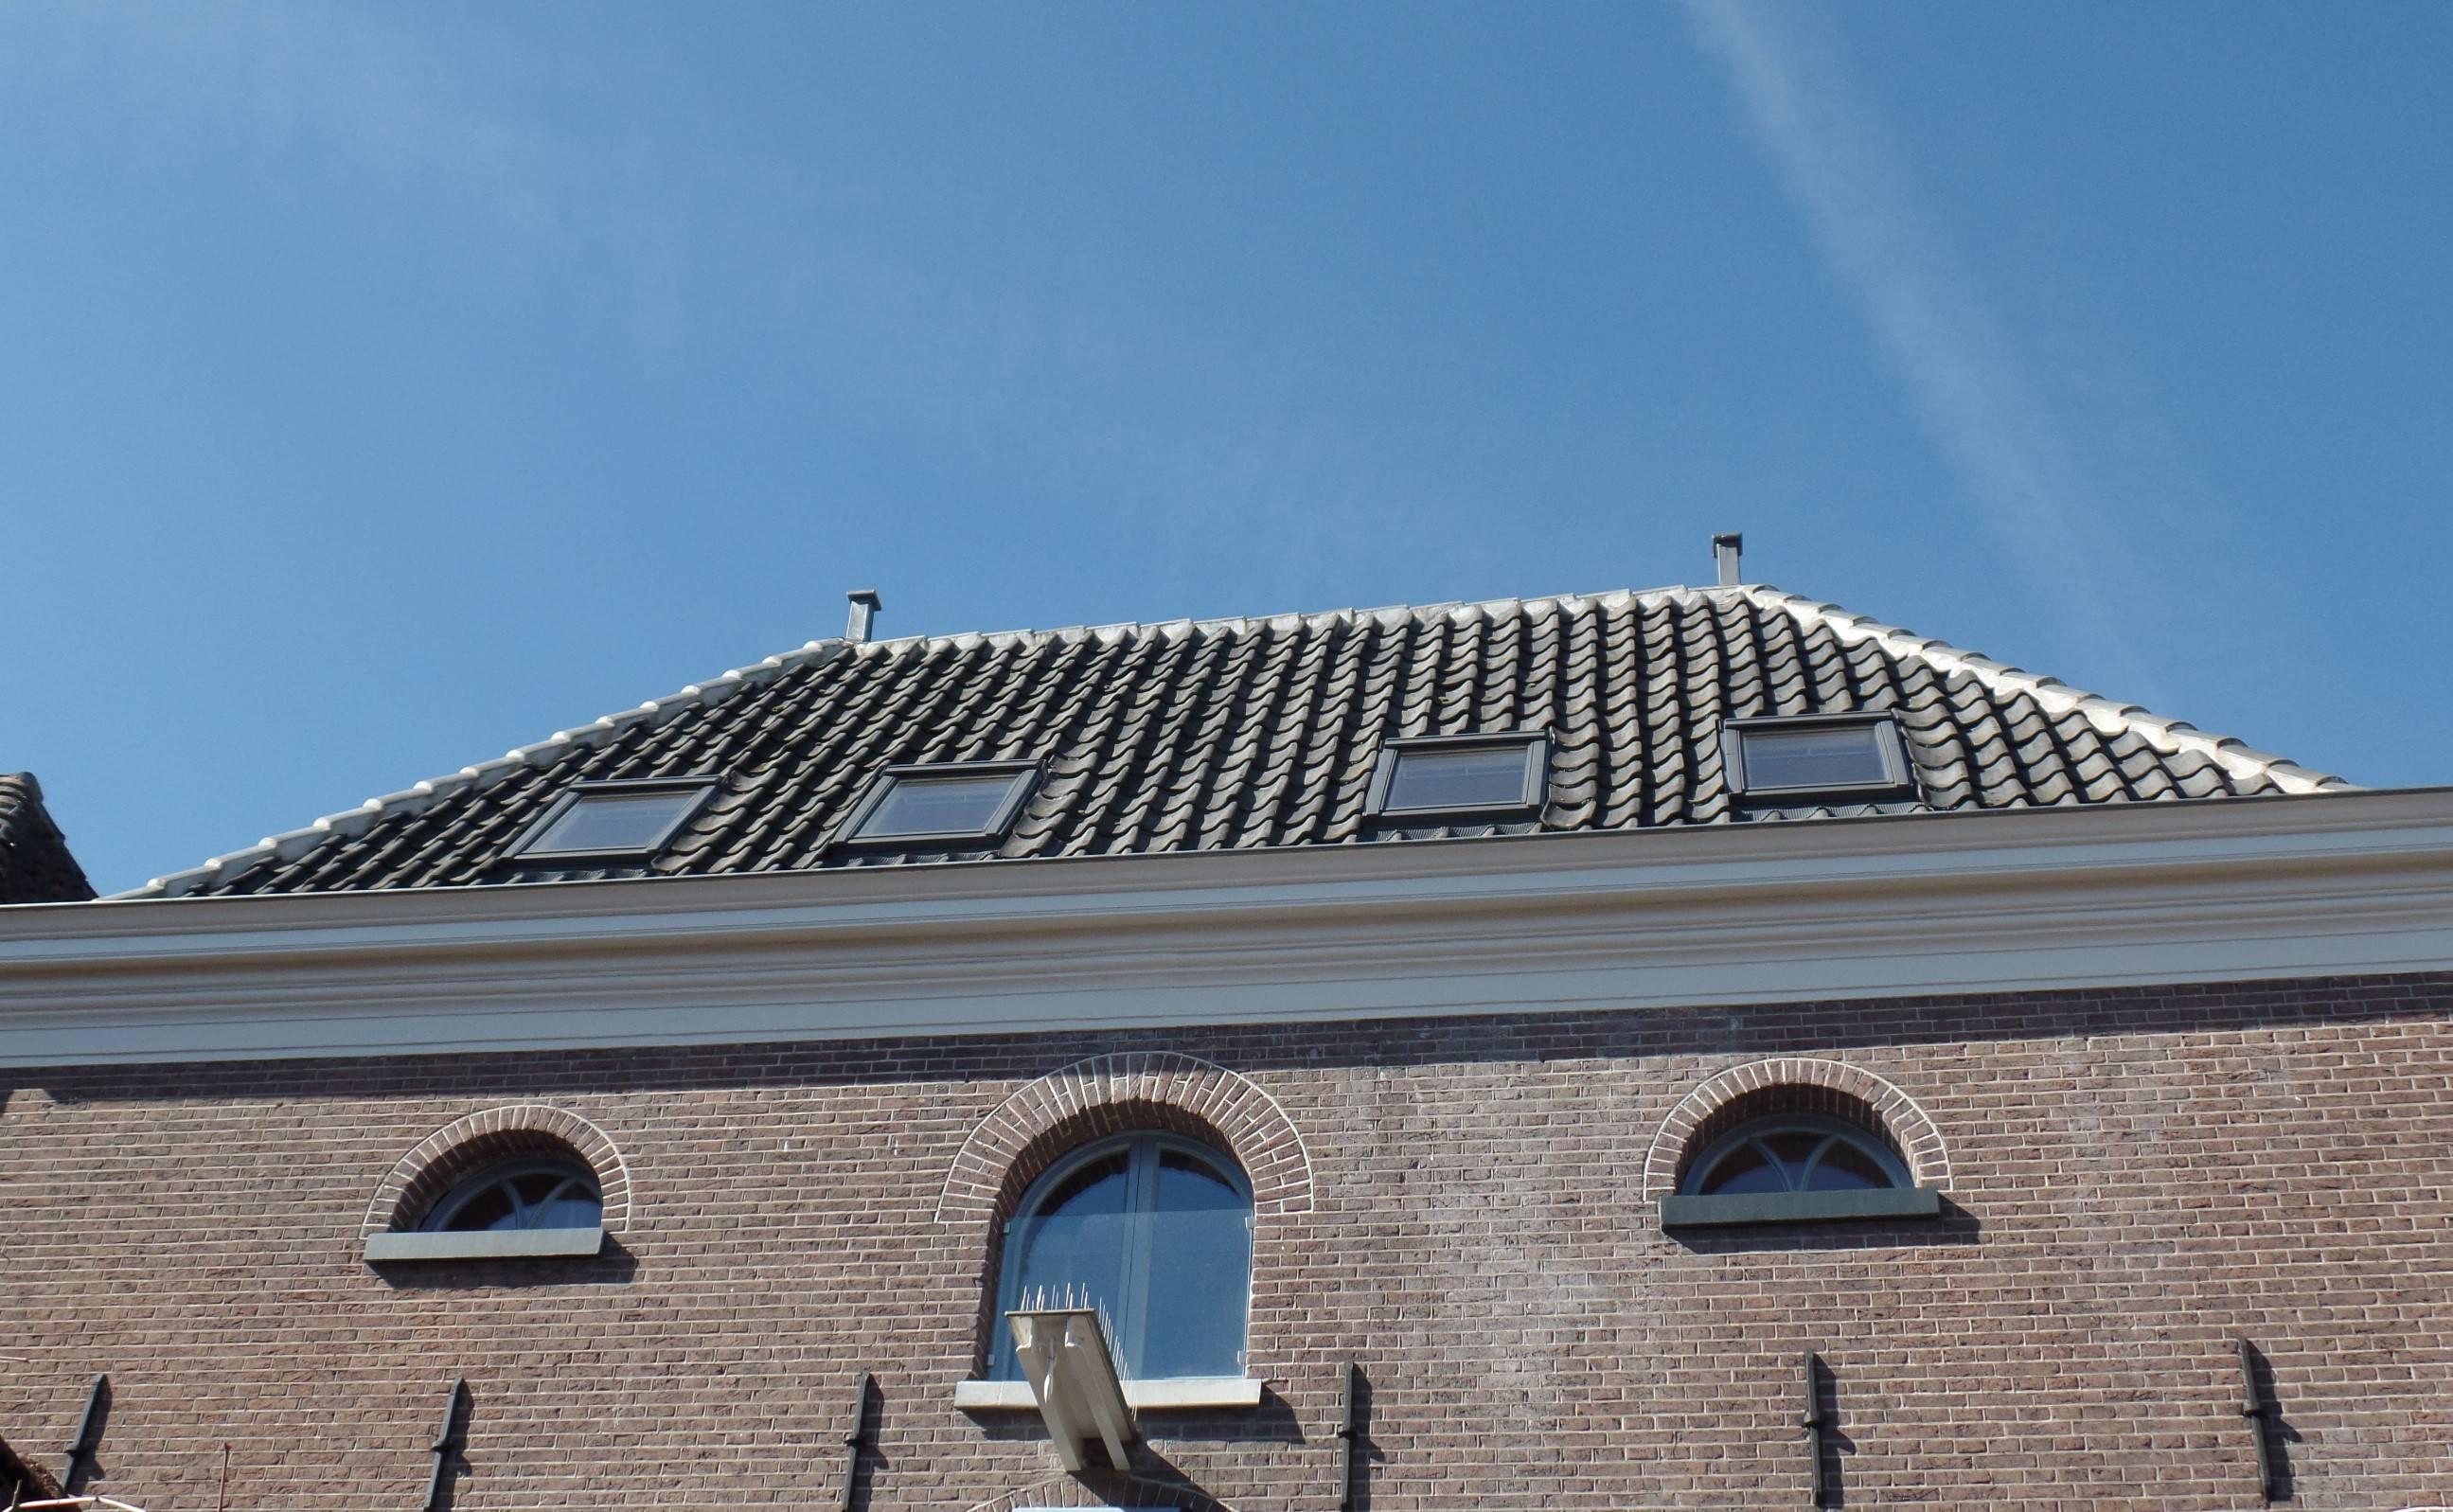 Kabeljauwsteeg, Gorinchem